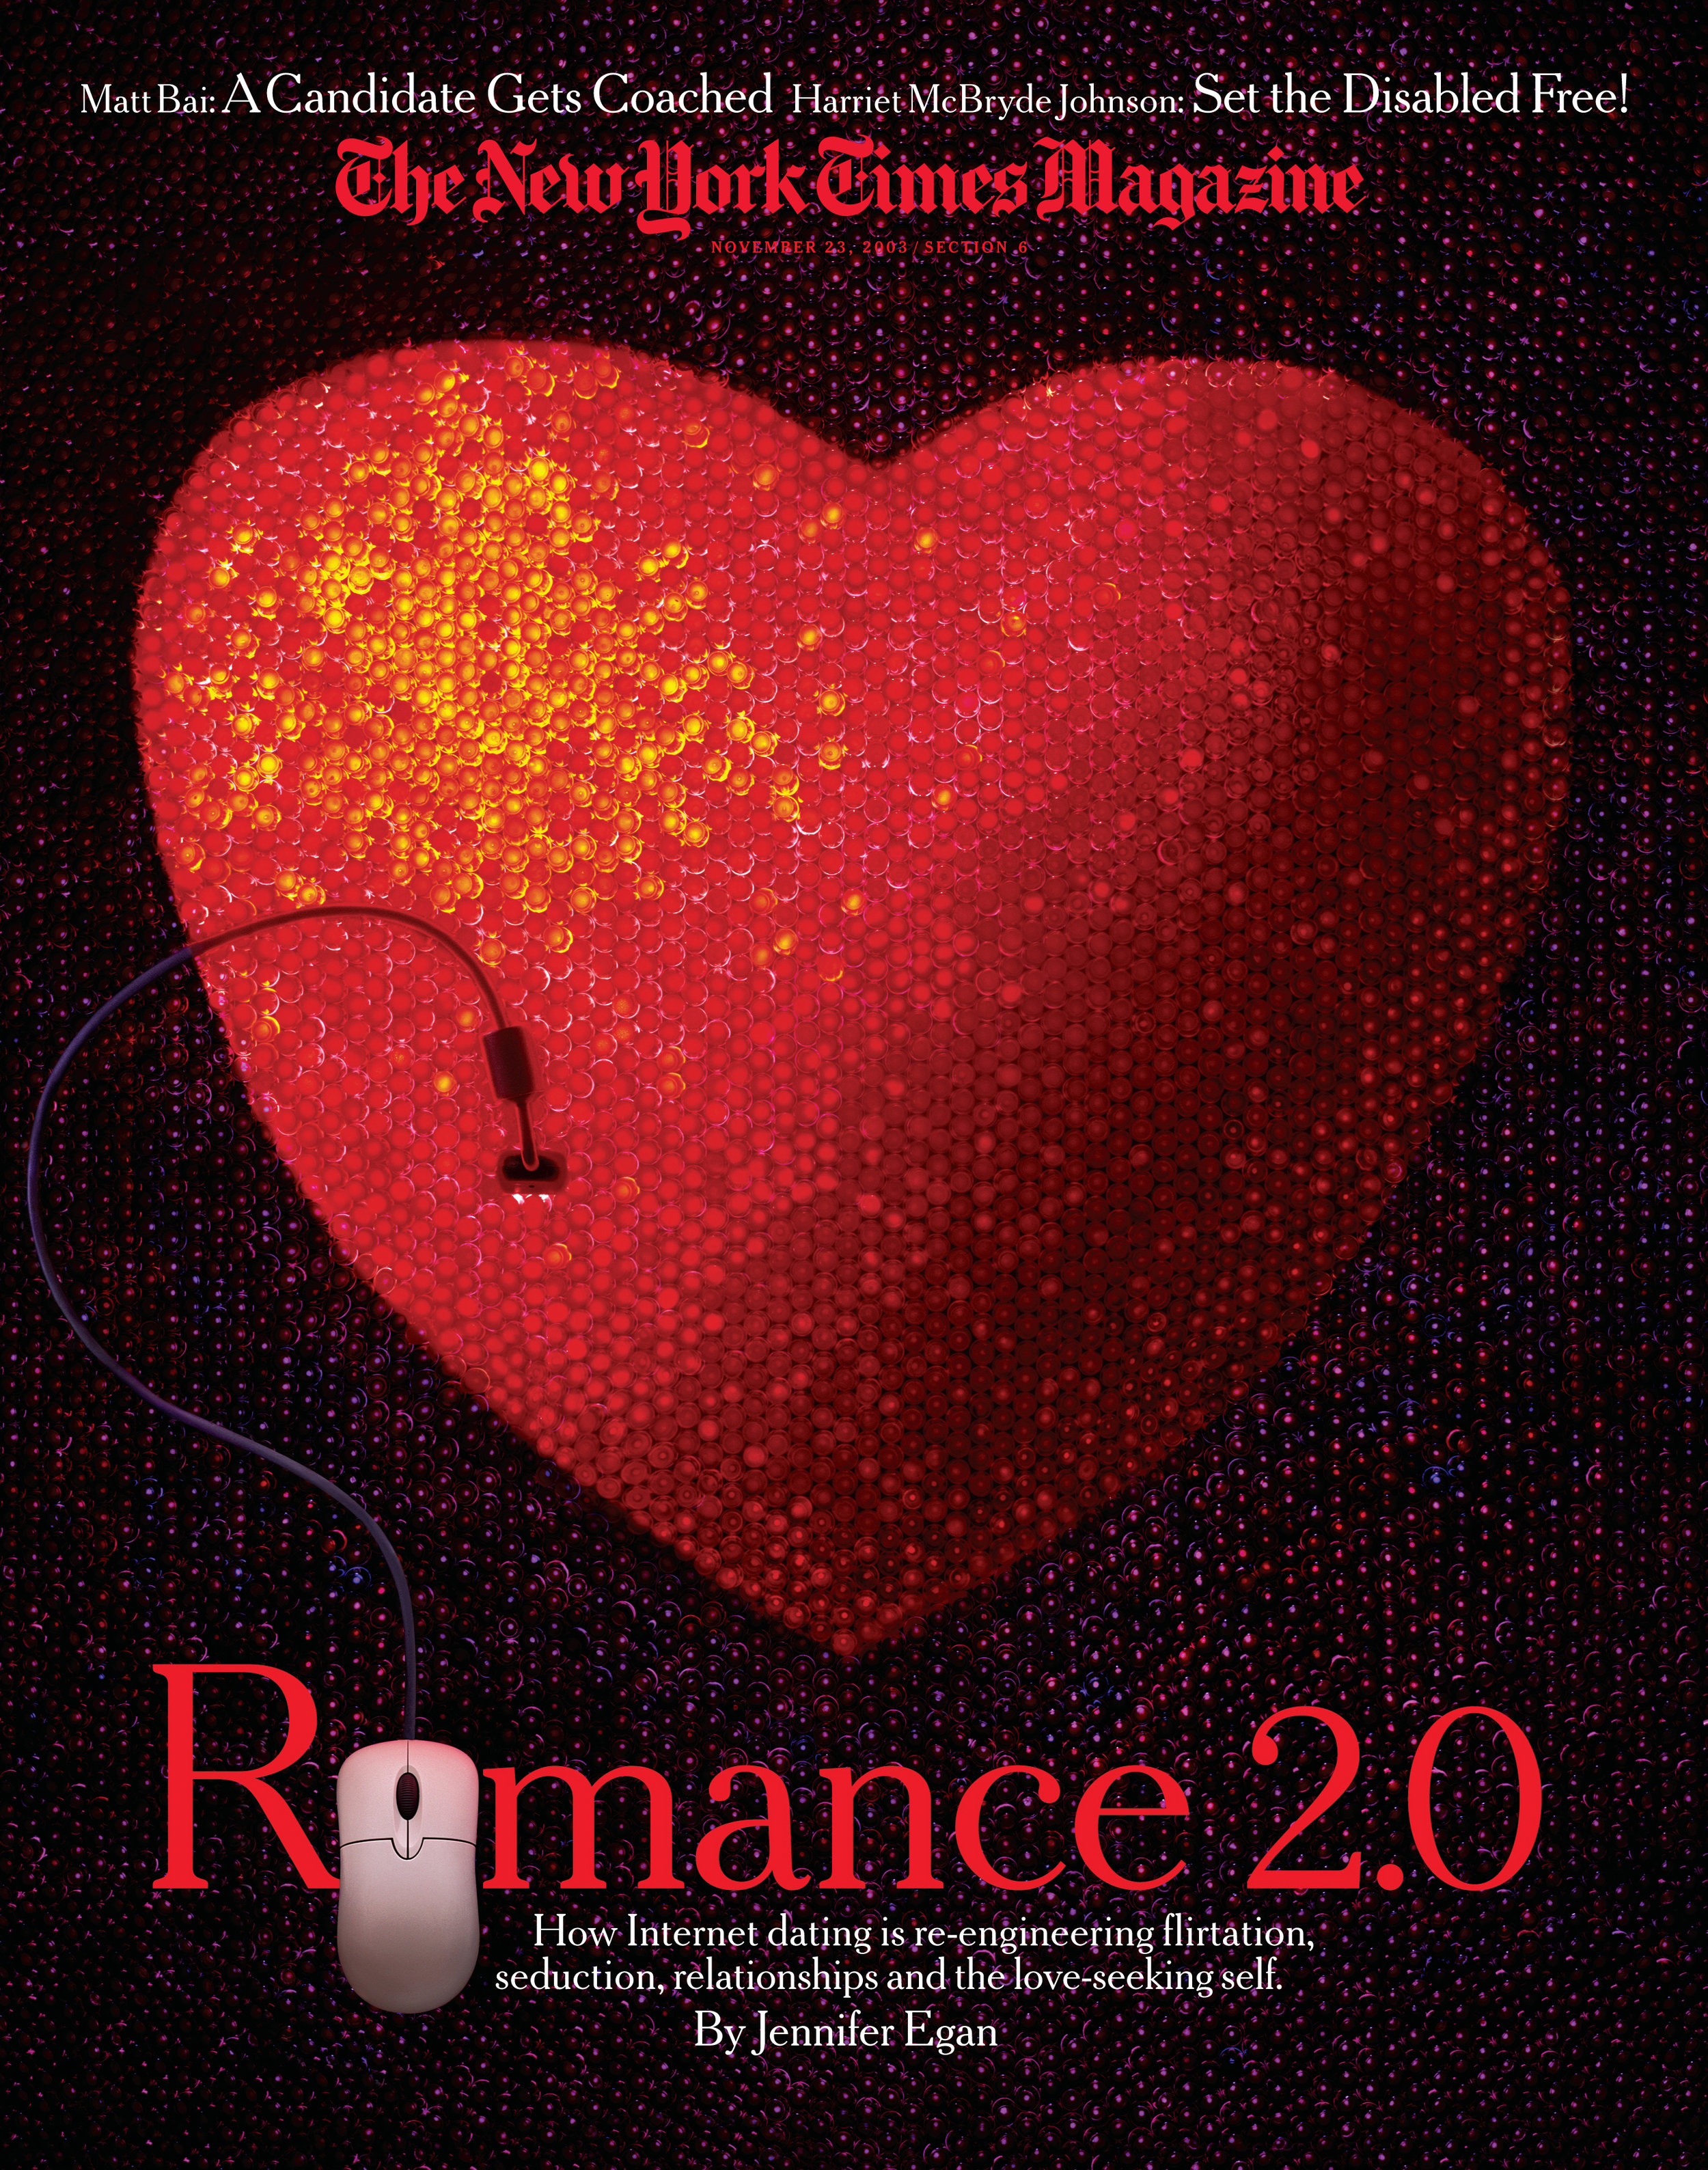 COVER.11.23.03.Romance 2.0-Cover.jpg